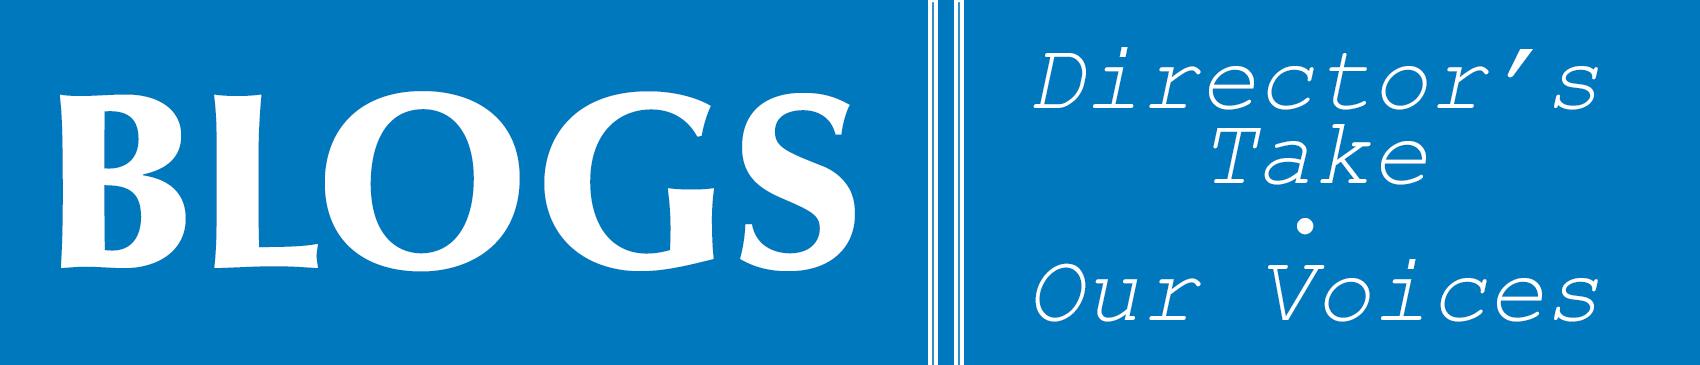 Blog banner 2017